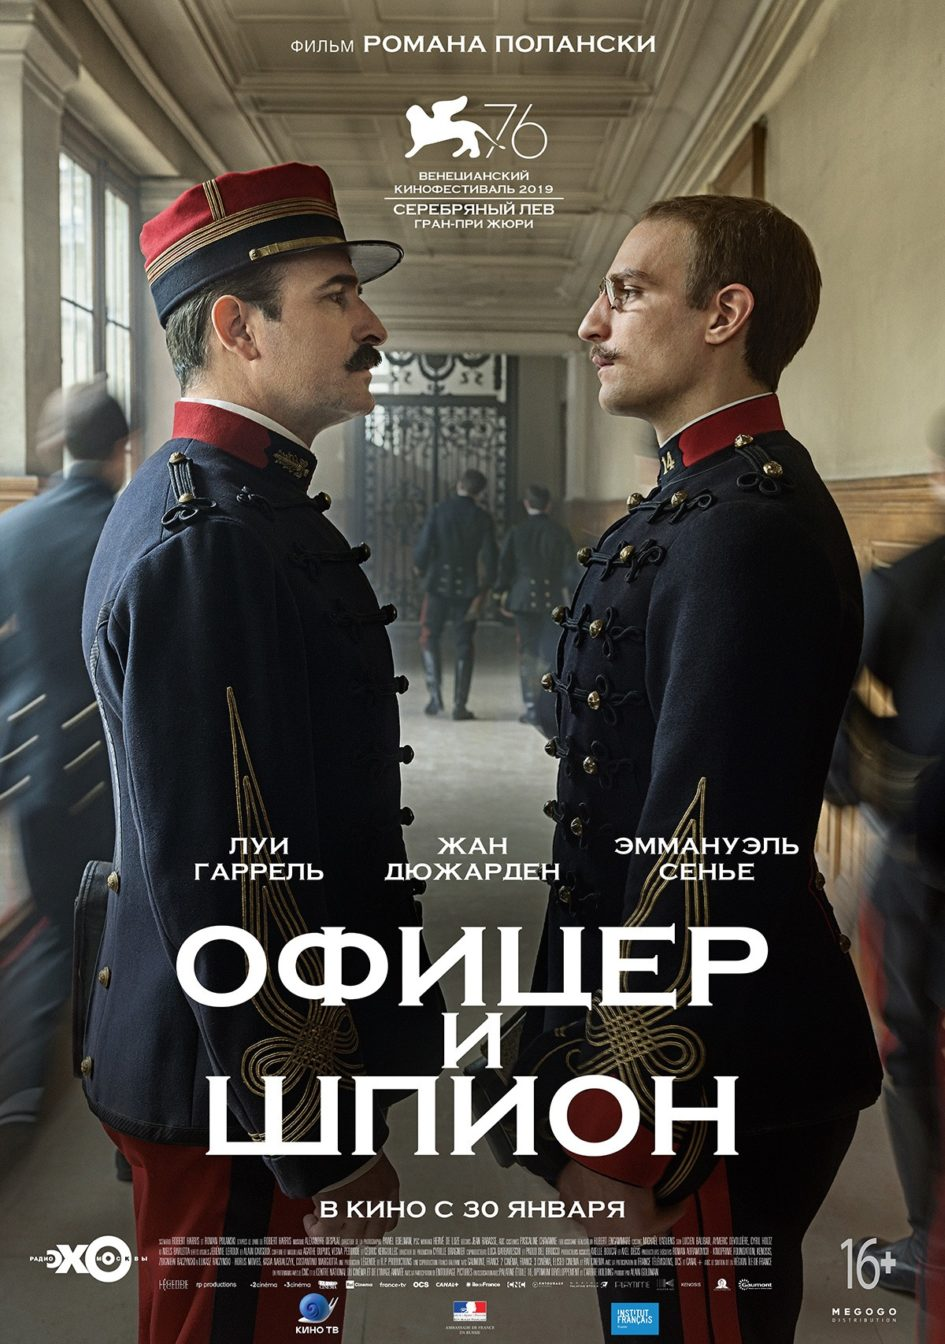 Офицер и шпион (2019) - OST